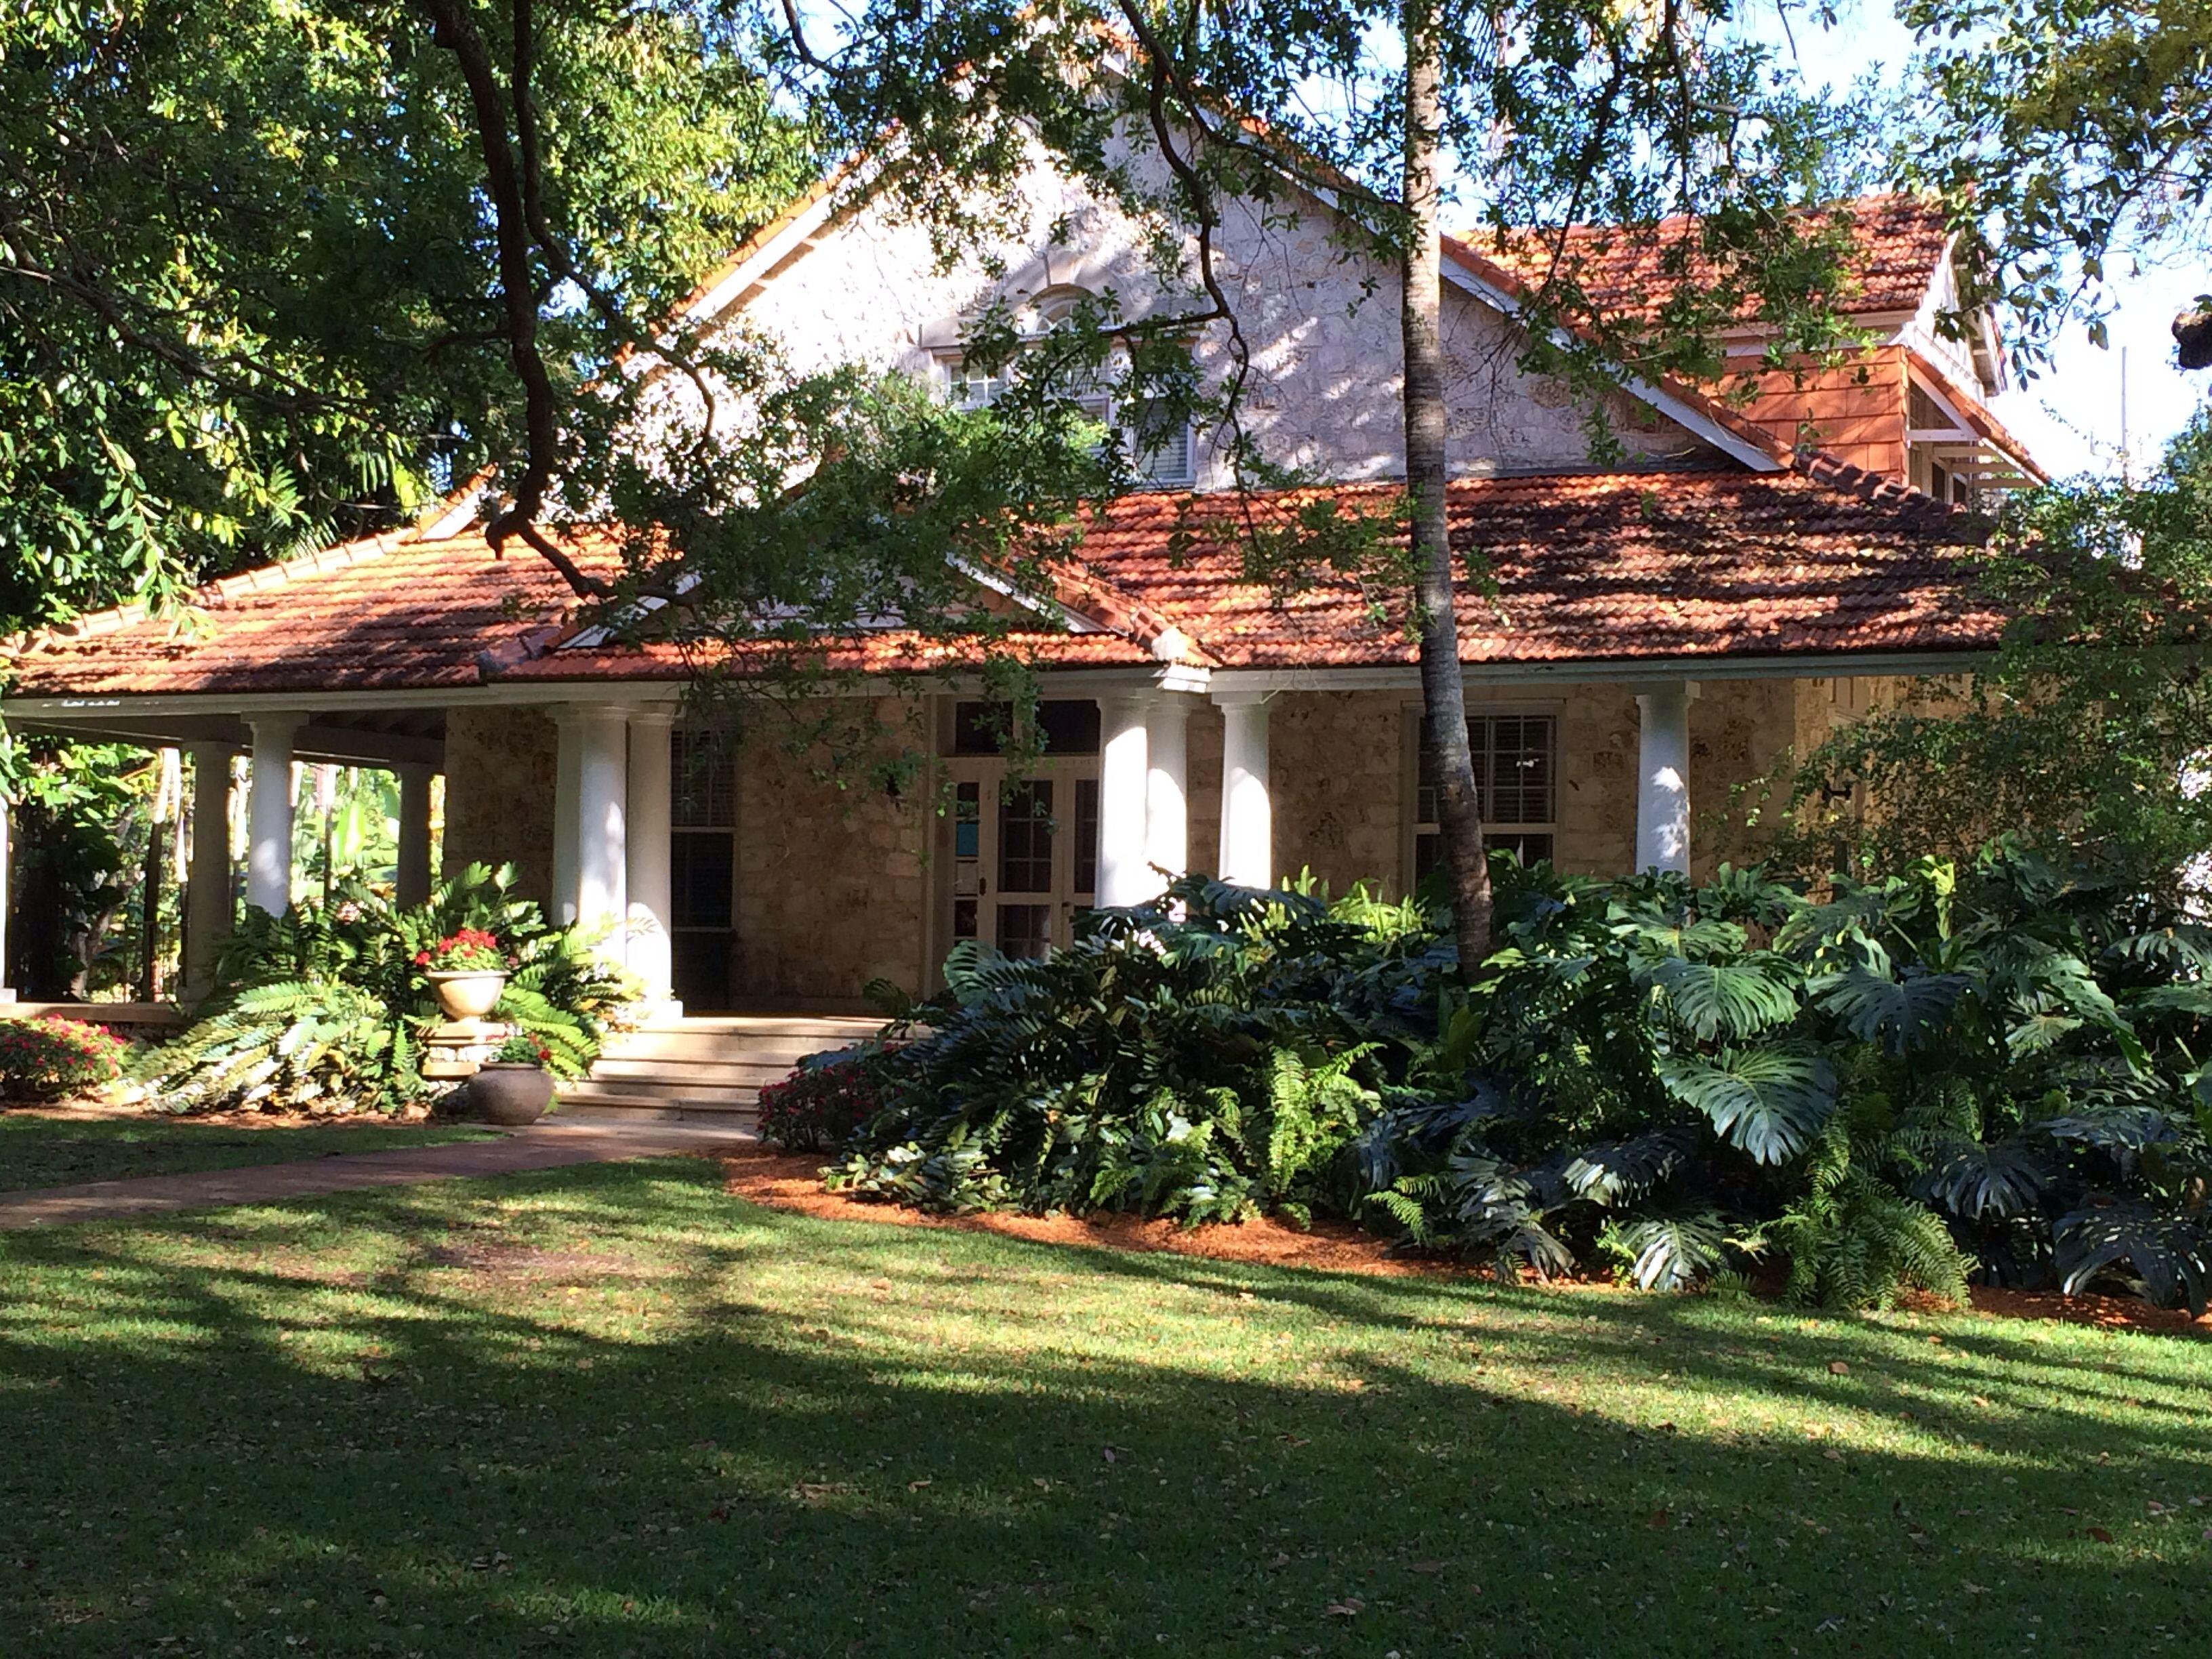 3d6ab18c19fa24a7b62645fbfde71769 - Coral Gables Merrick House And Gardens